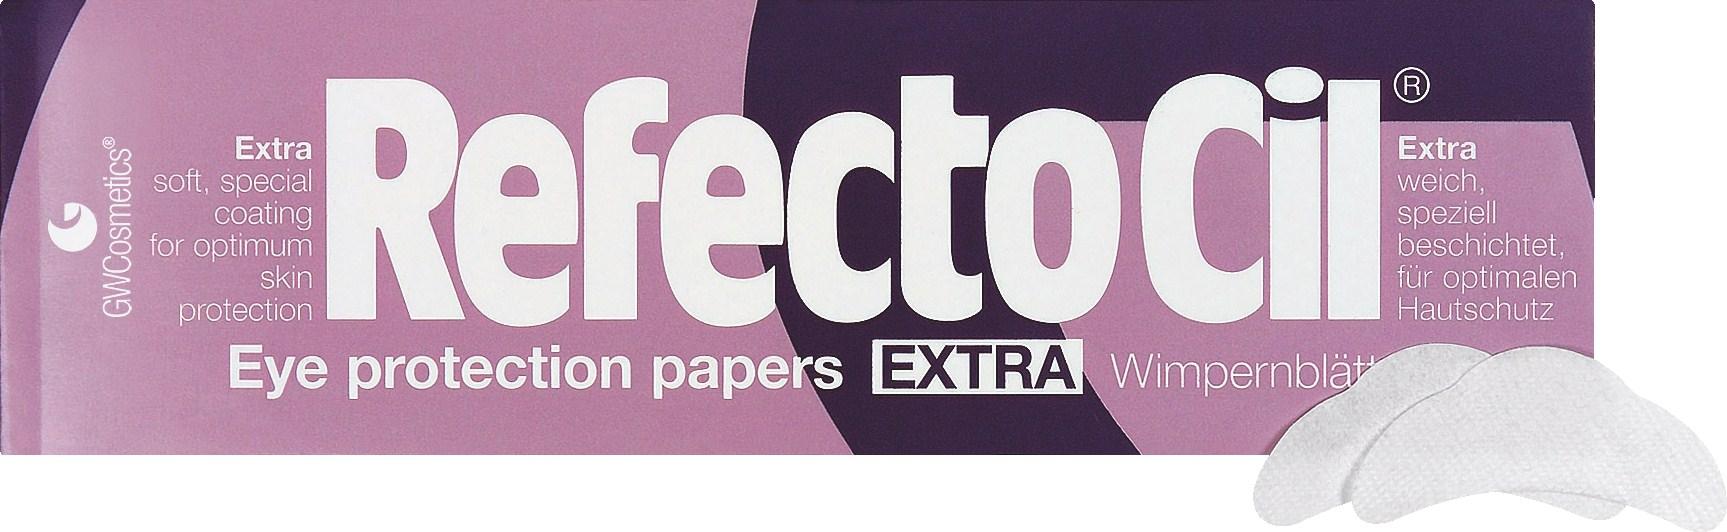 REFECTOCIL Салфетки под ресницы / Eye Protection Papers Extra 80 шт - Салфетки